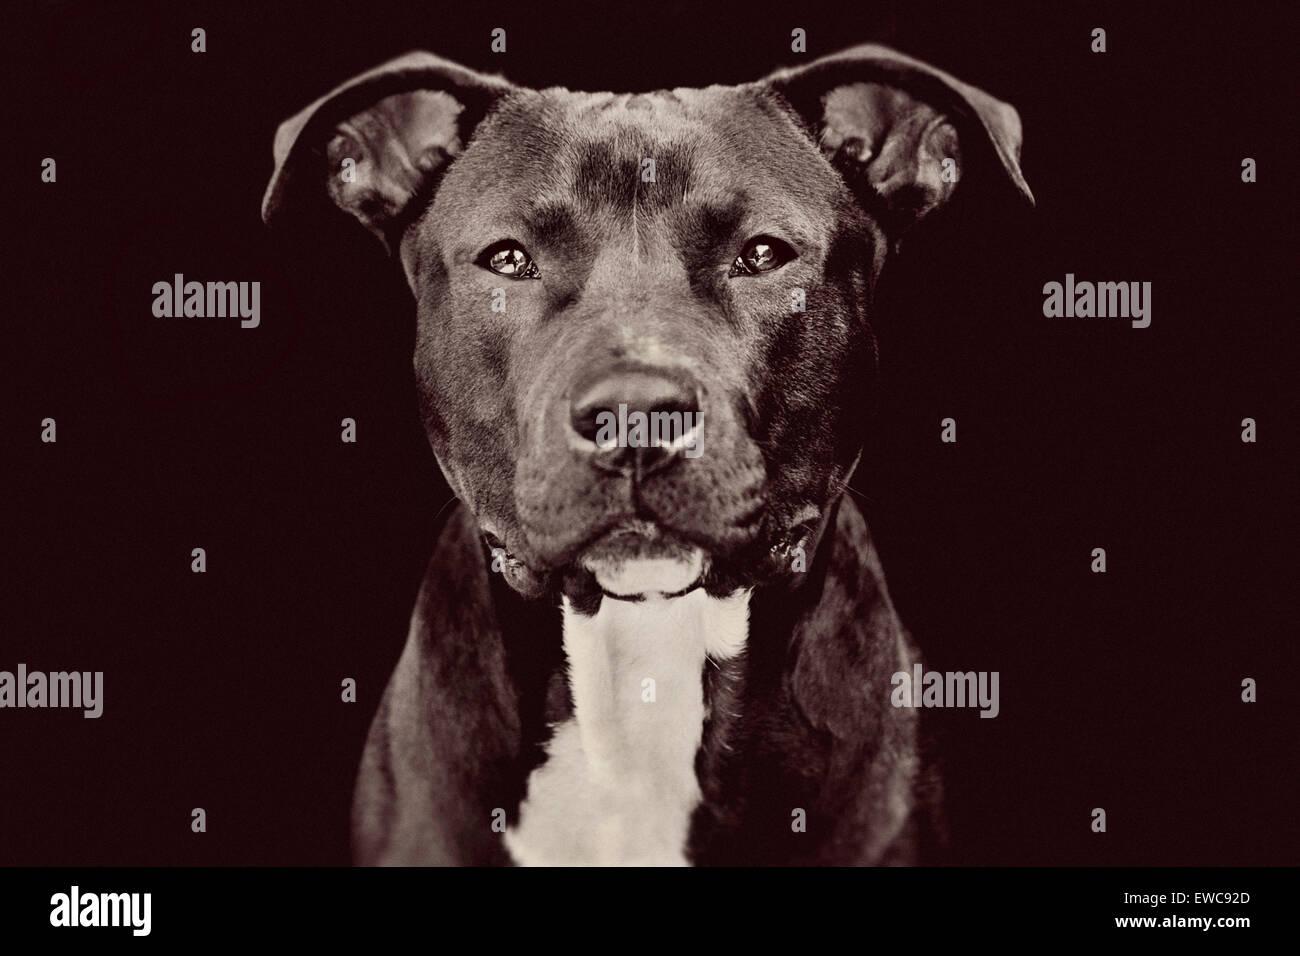 Studio portrait of a medium large adult black Pitbull dog on black background facing camera with riveting eye contact - Stock Image